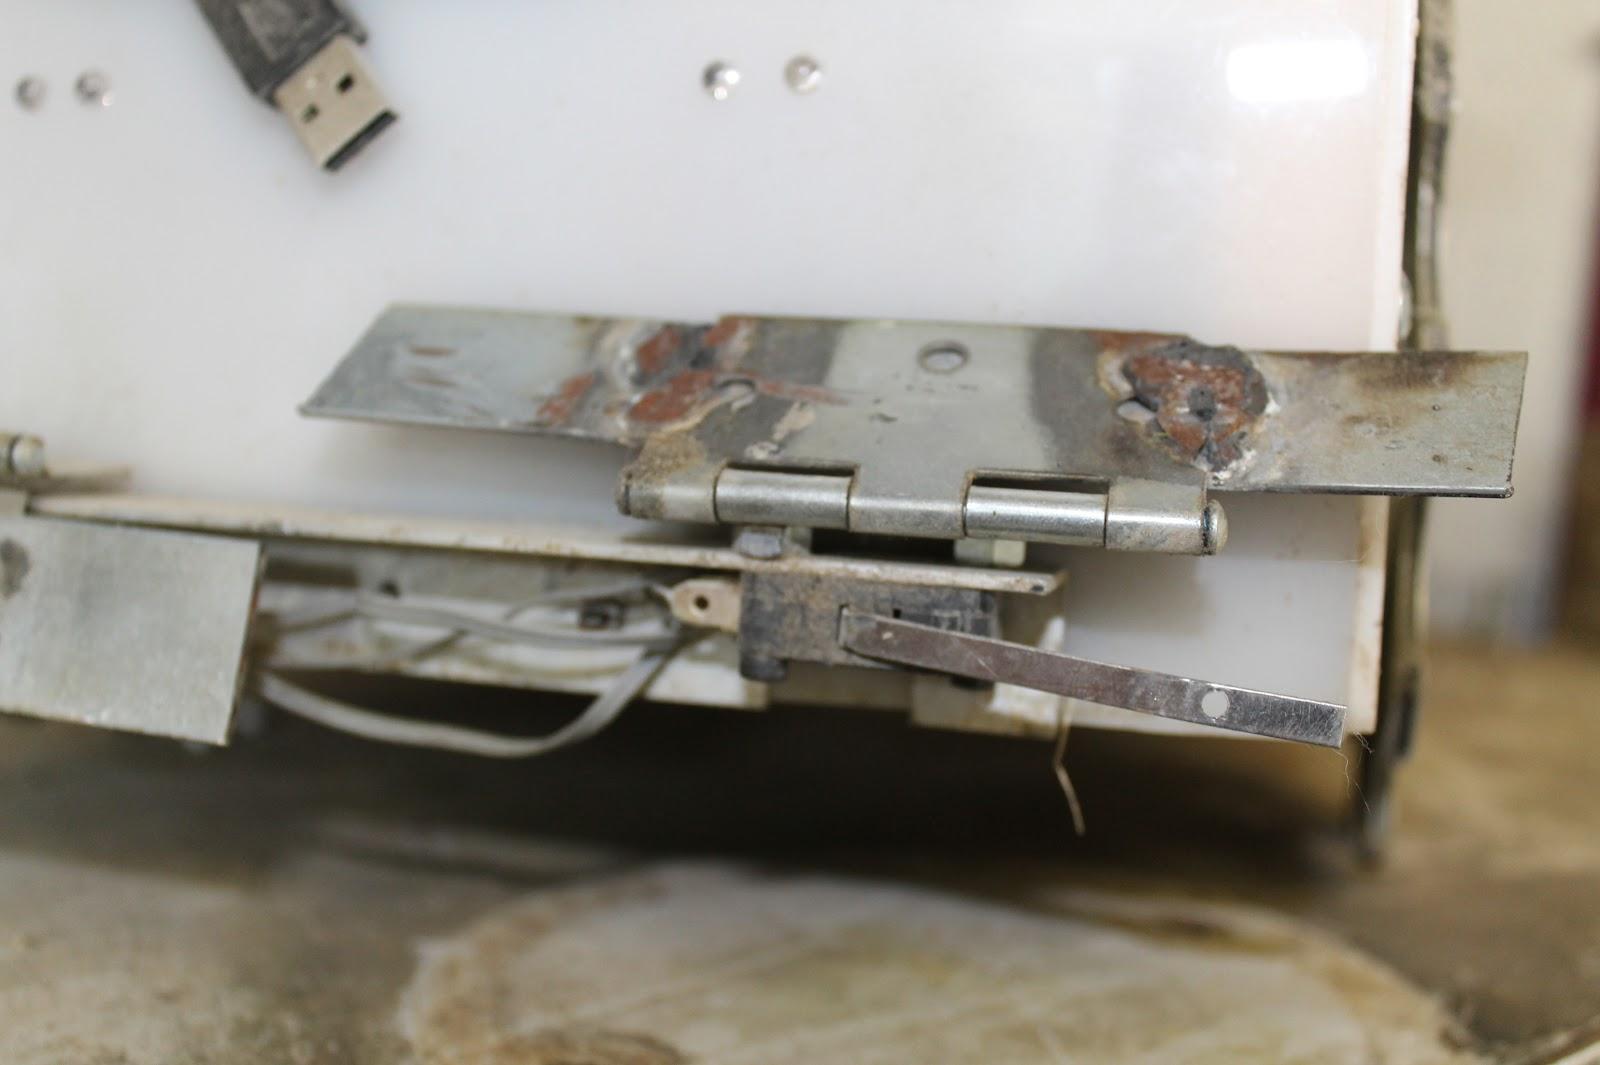 Gt diy cutflower tondeuse robot par arduino pare choc